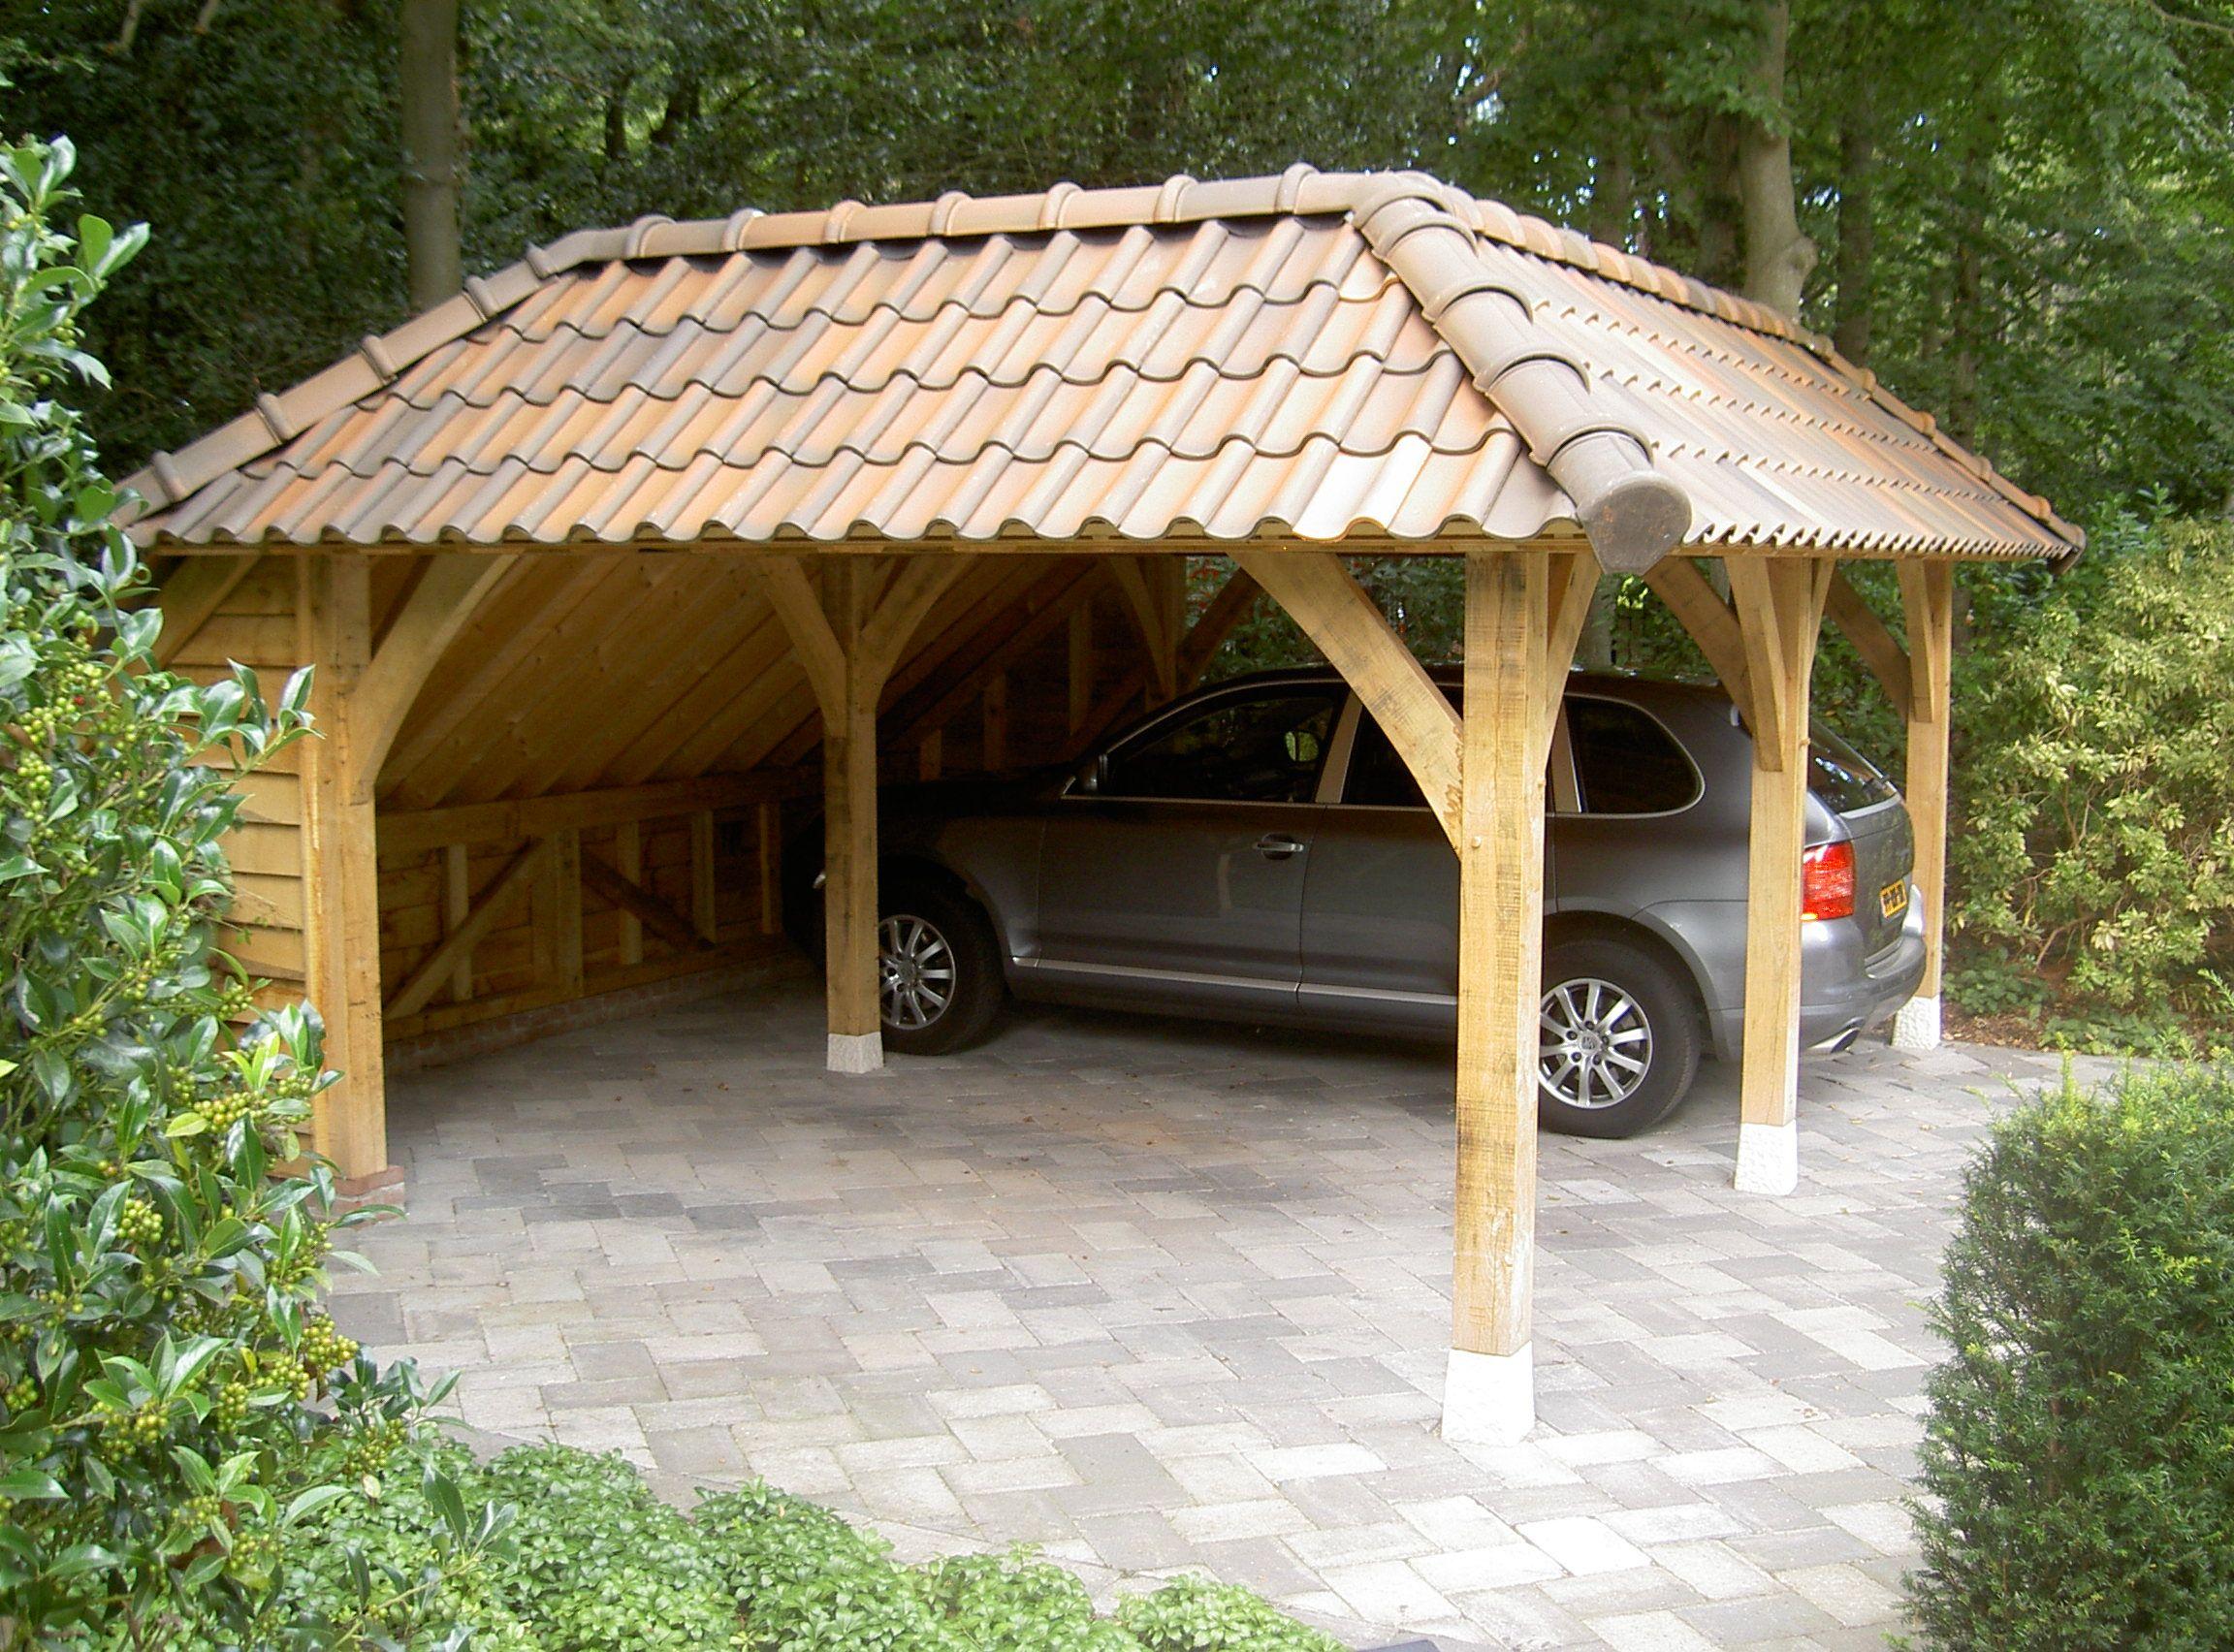 eiken duurzaam eikenhout eikenhouten bijgebouw bijgebouwen atelier carport garage gastenverblijf. Black Bedroom Furniture Sets. Home Design Ideas